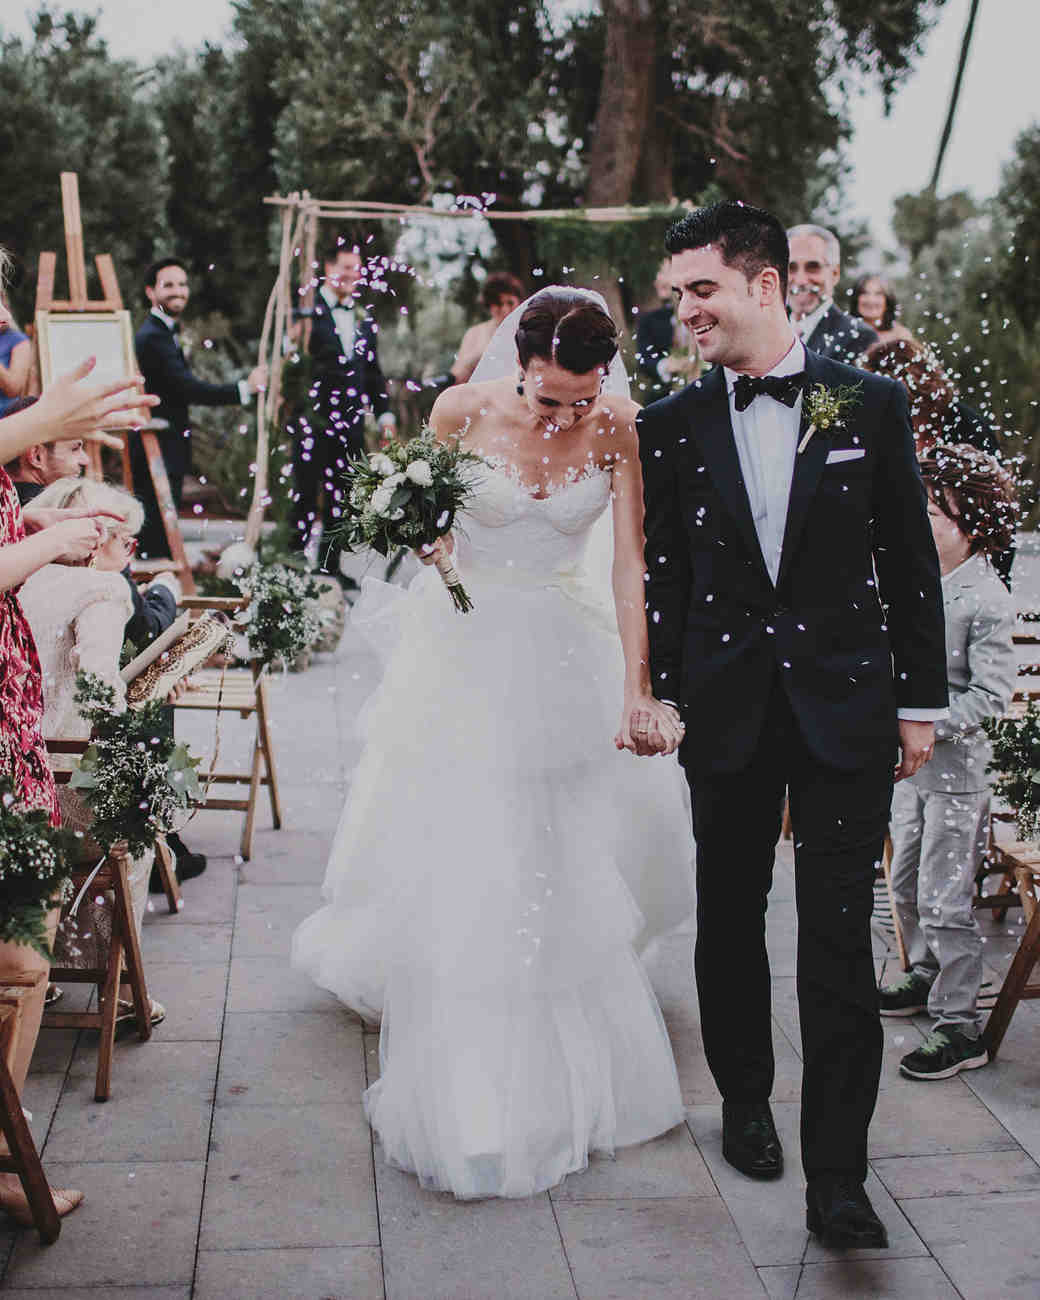 tamara-brett-wedding-ceremony-1246-s112120-0915.jpg